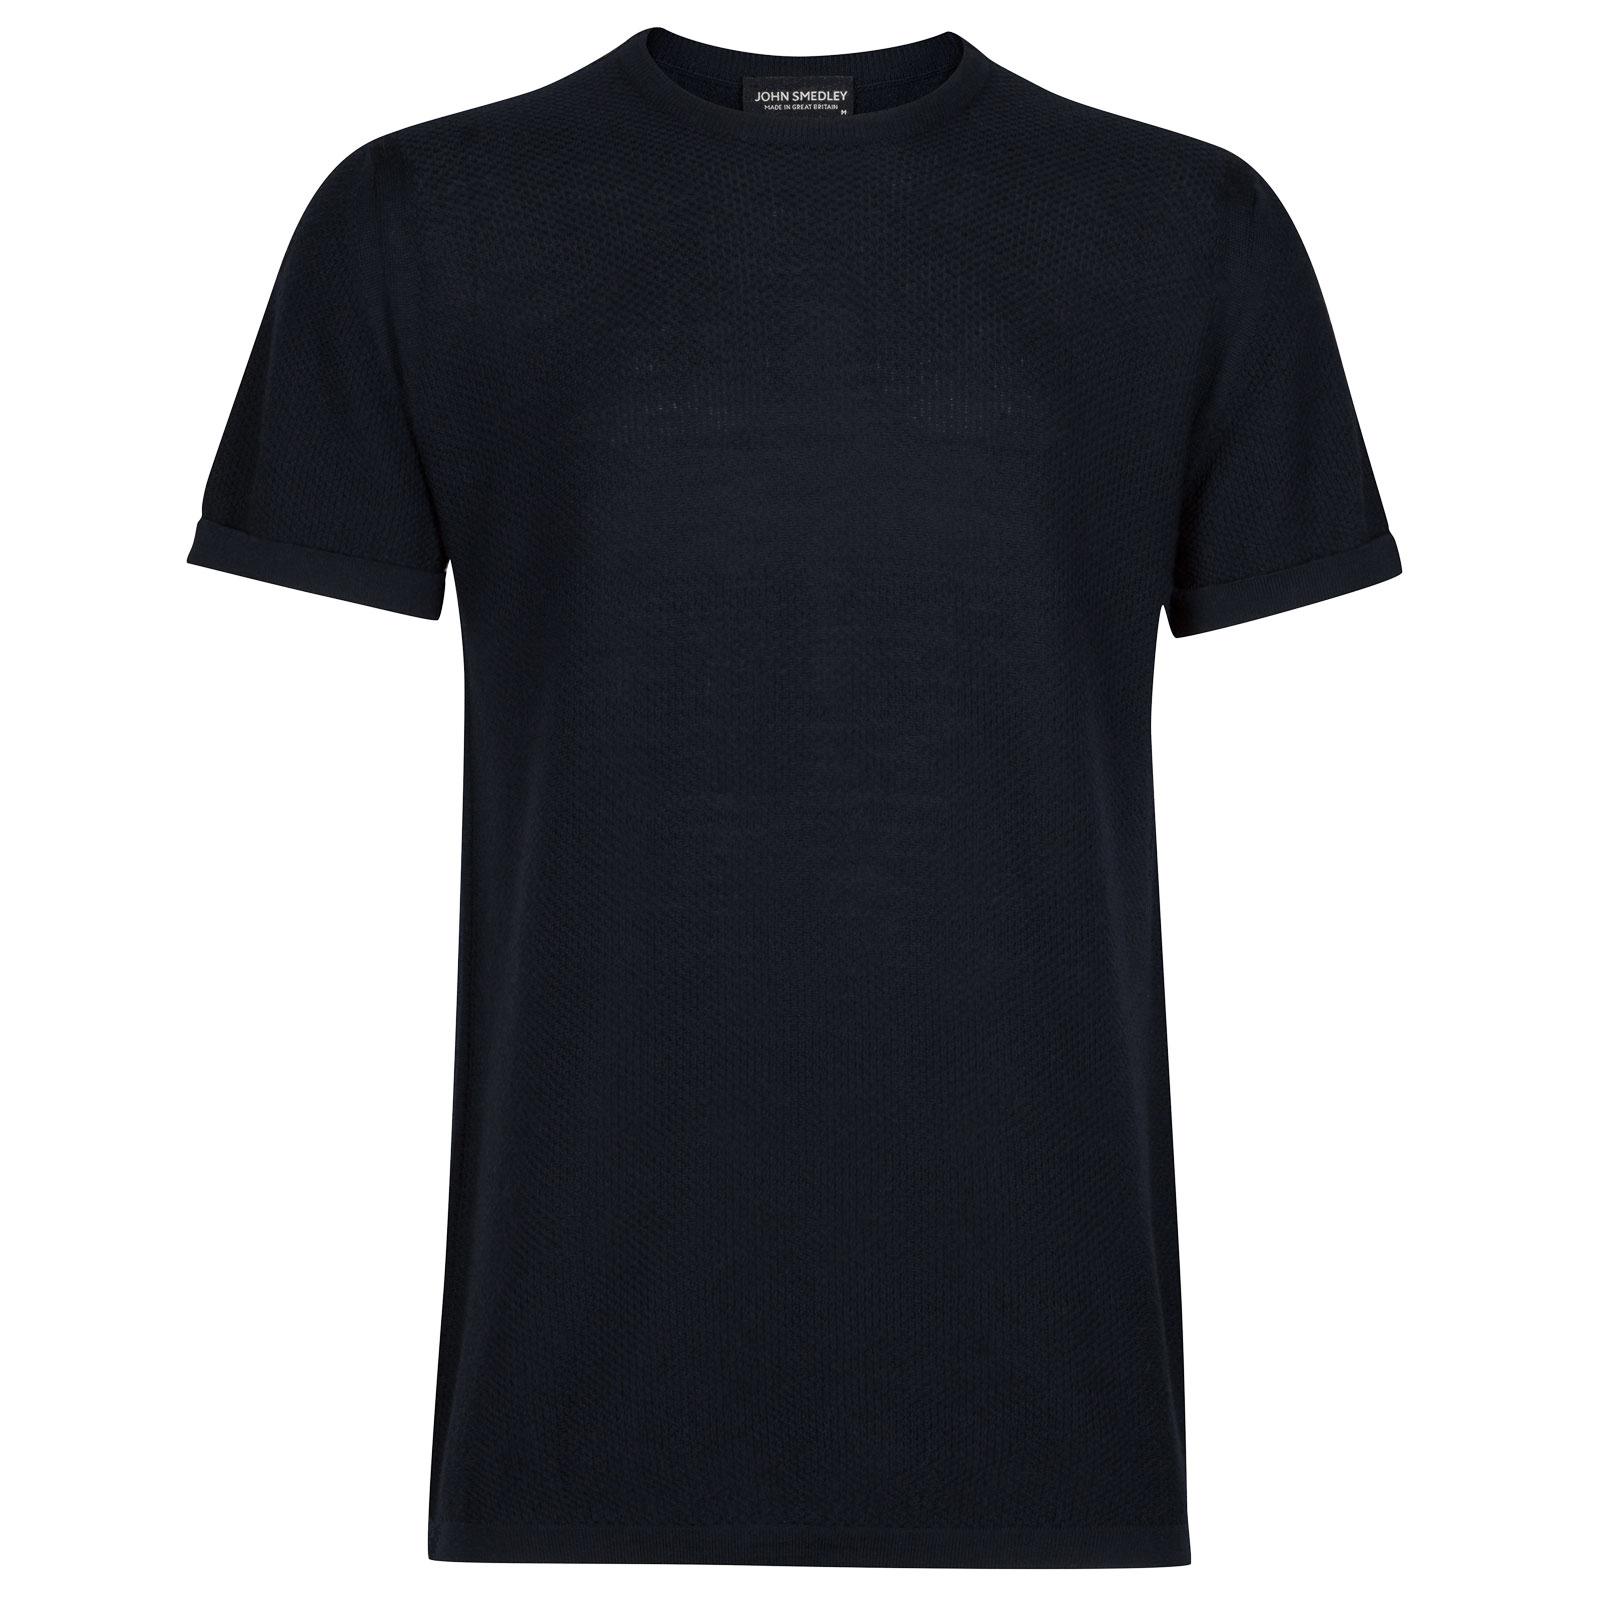 John Smedley 2Singular Merino Wool T-Shirt in Midnight-S